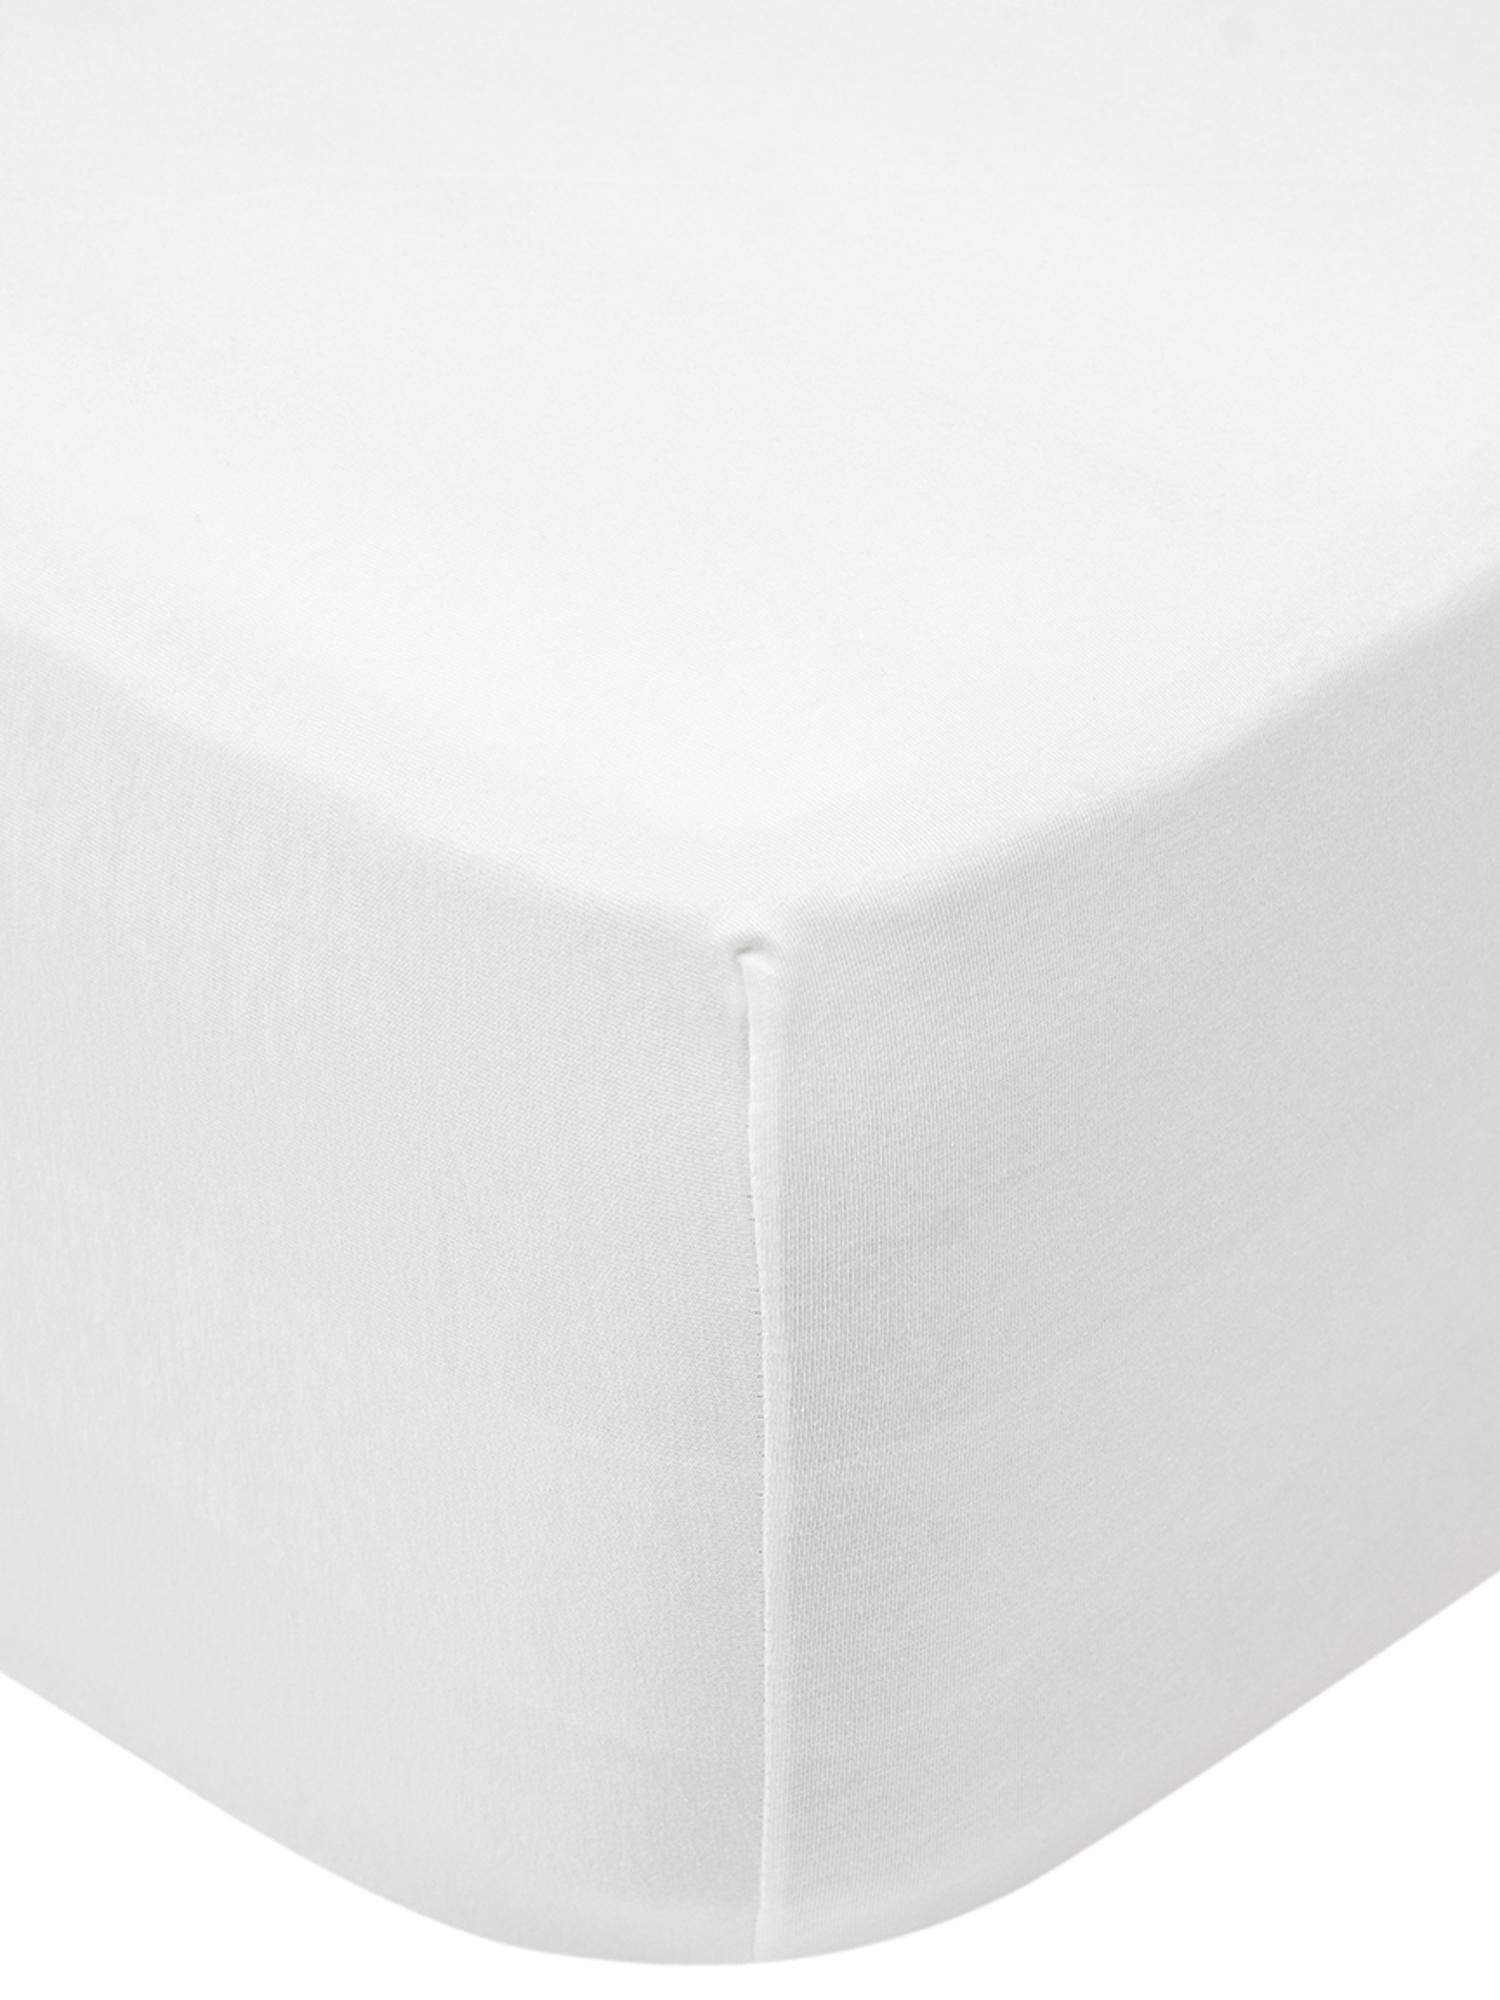 Lenzuolo con angoli  in jersey-elastan Lara, 95% cotone, 5% spandex, Color crema, Larg. 160 x Lung. 200 cm